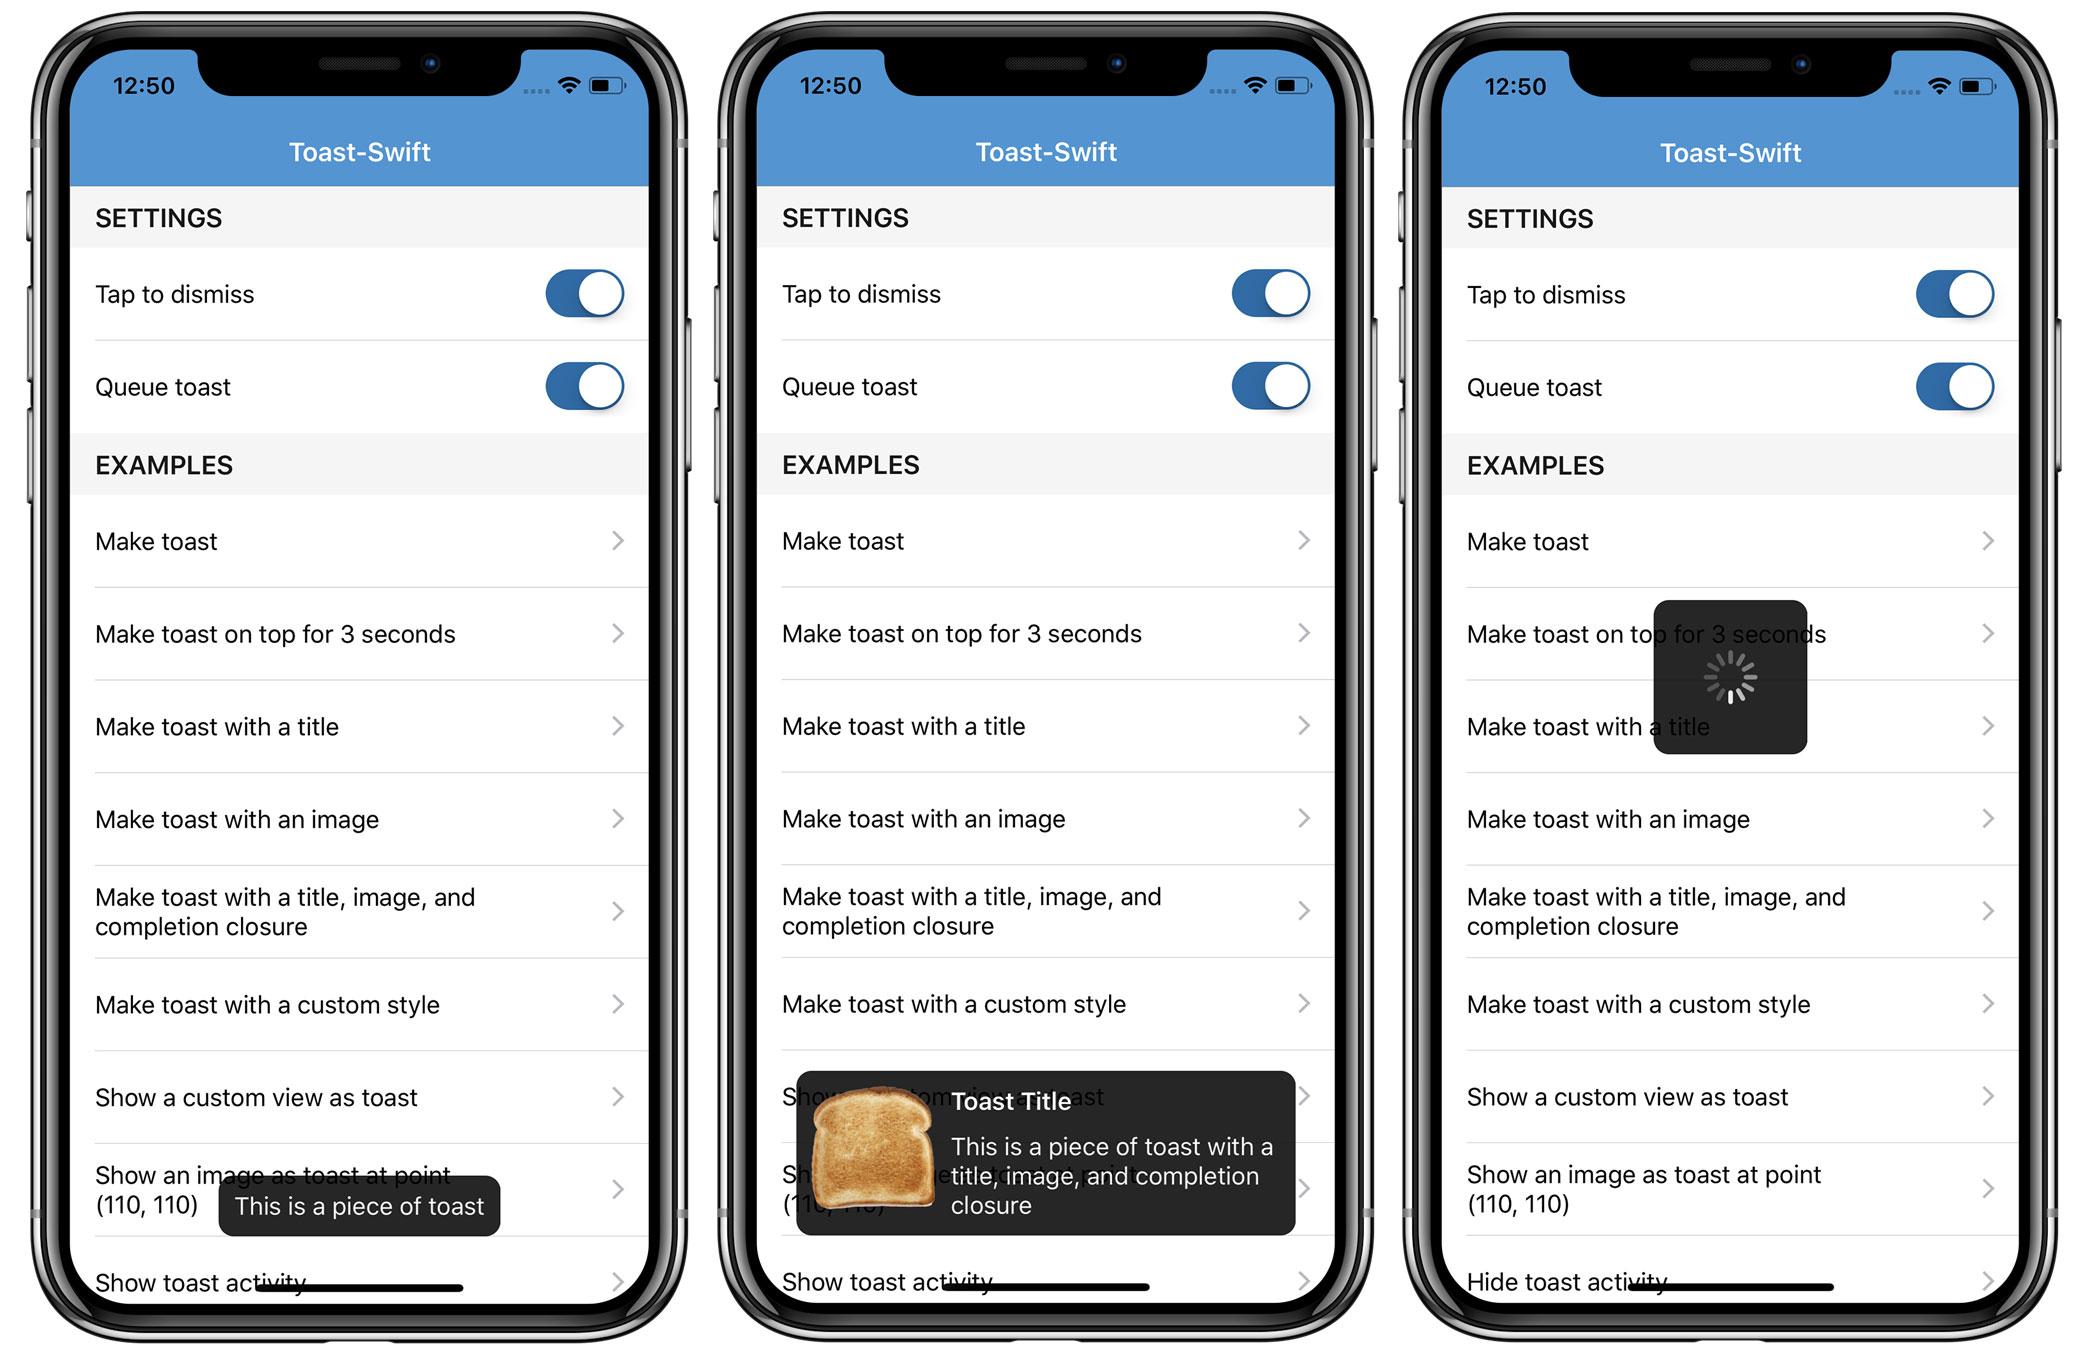 Toast-Swift Screenshots